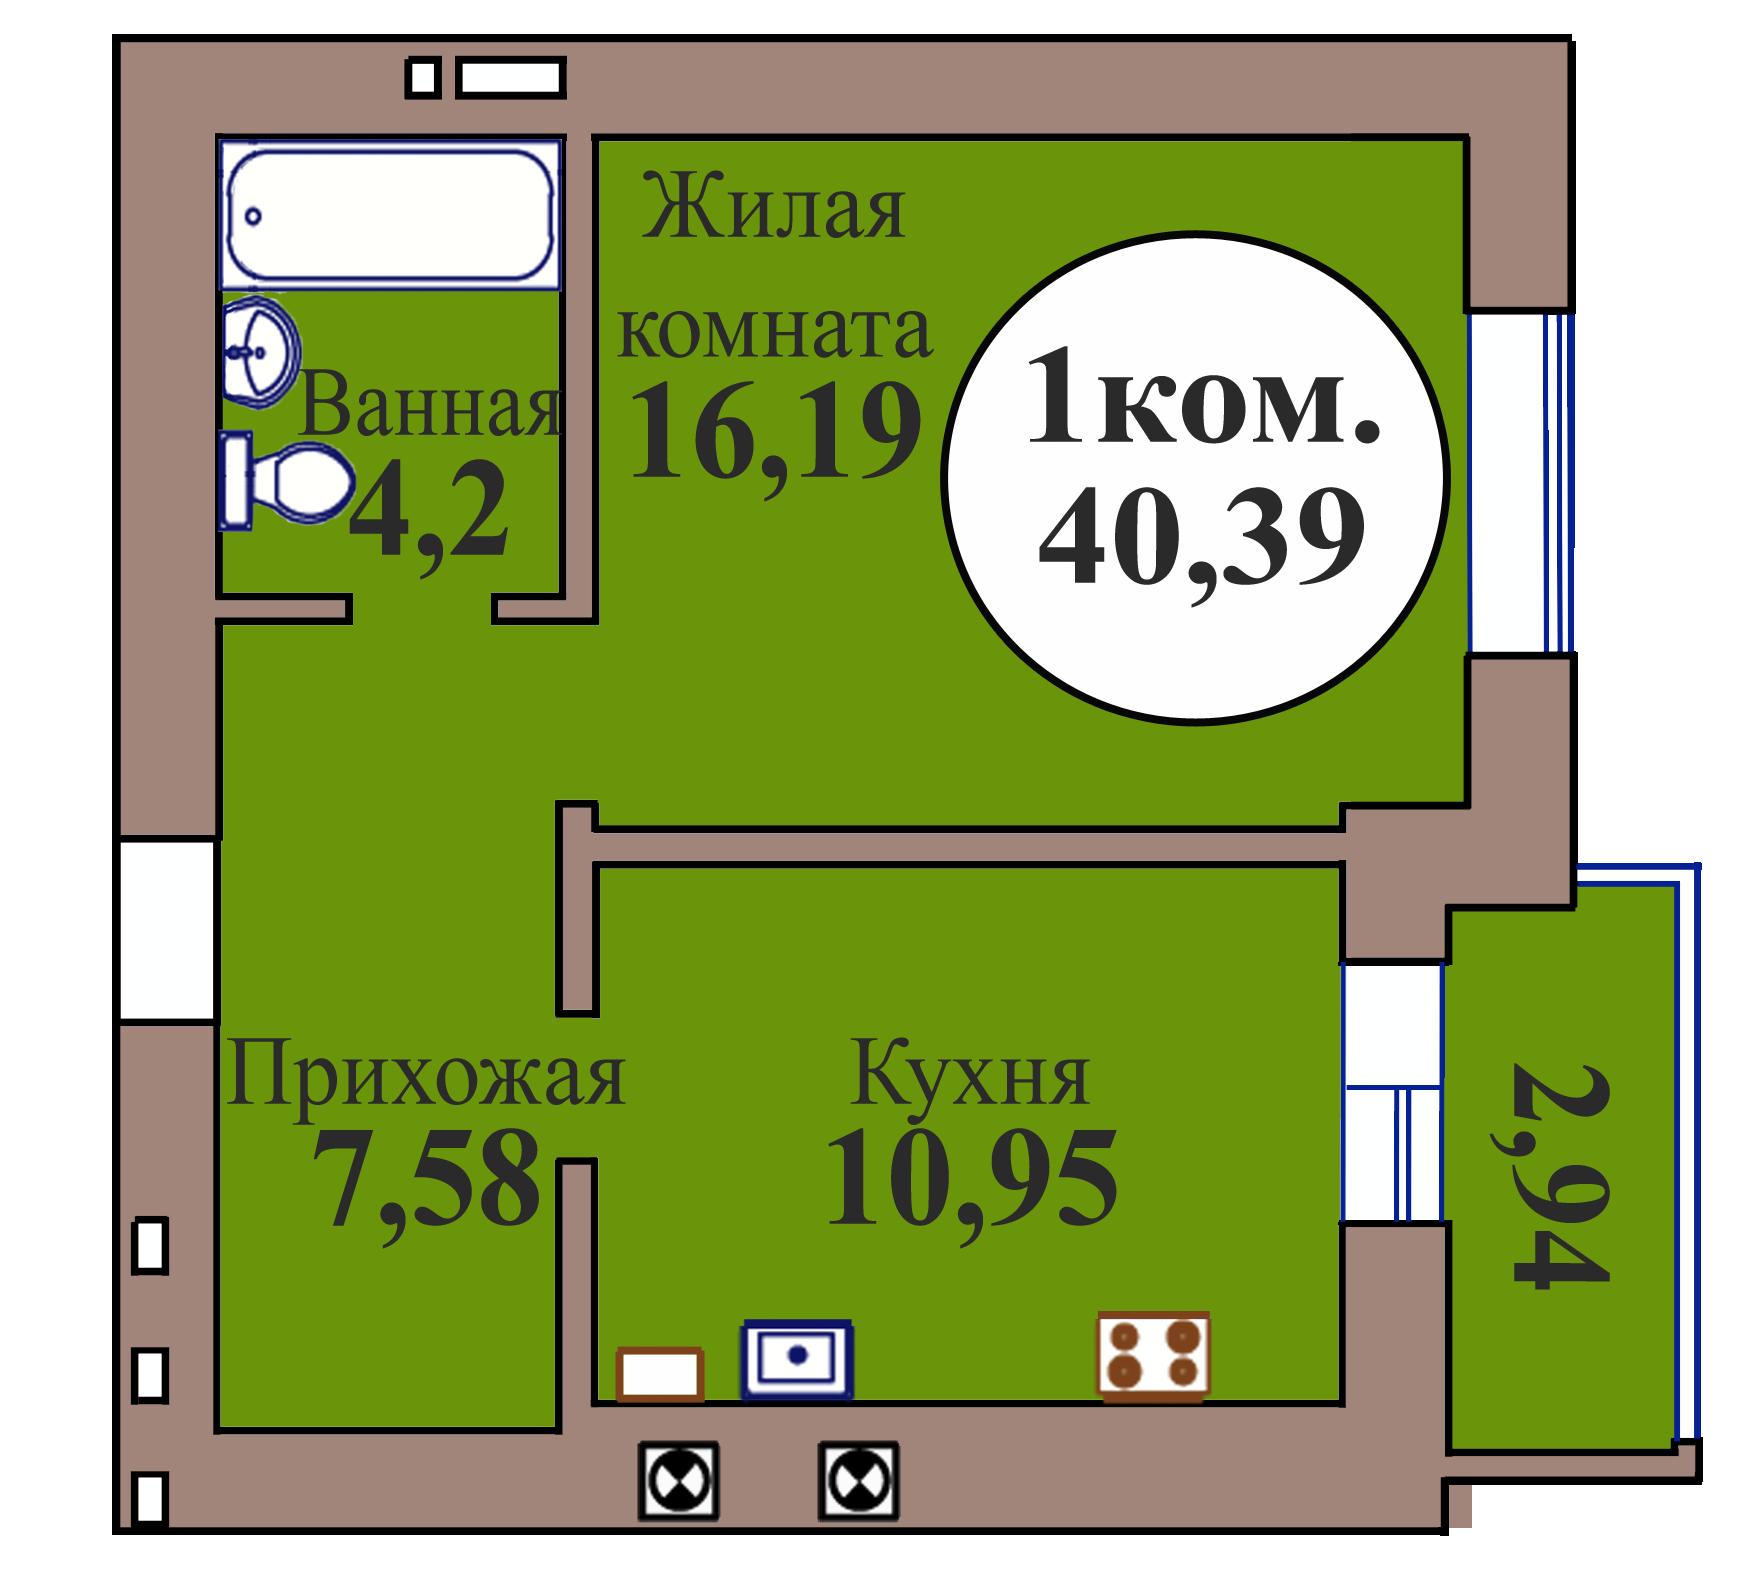 1-комн. кв. по пер. Калининградский, 5 кв. 129 в Калининграде